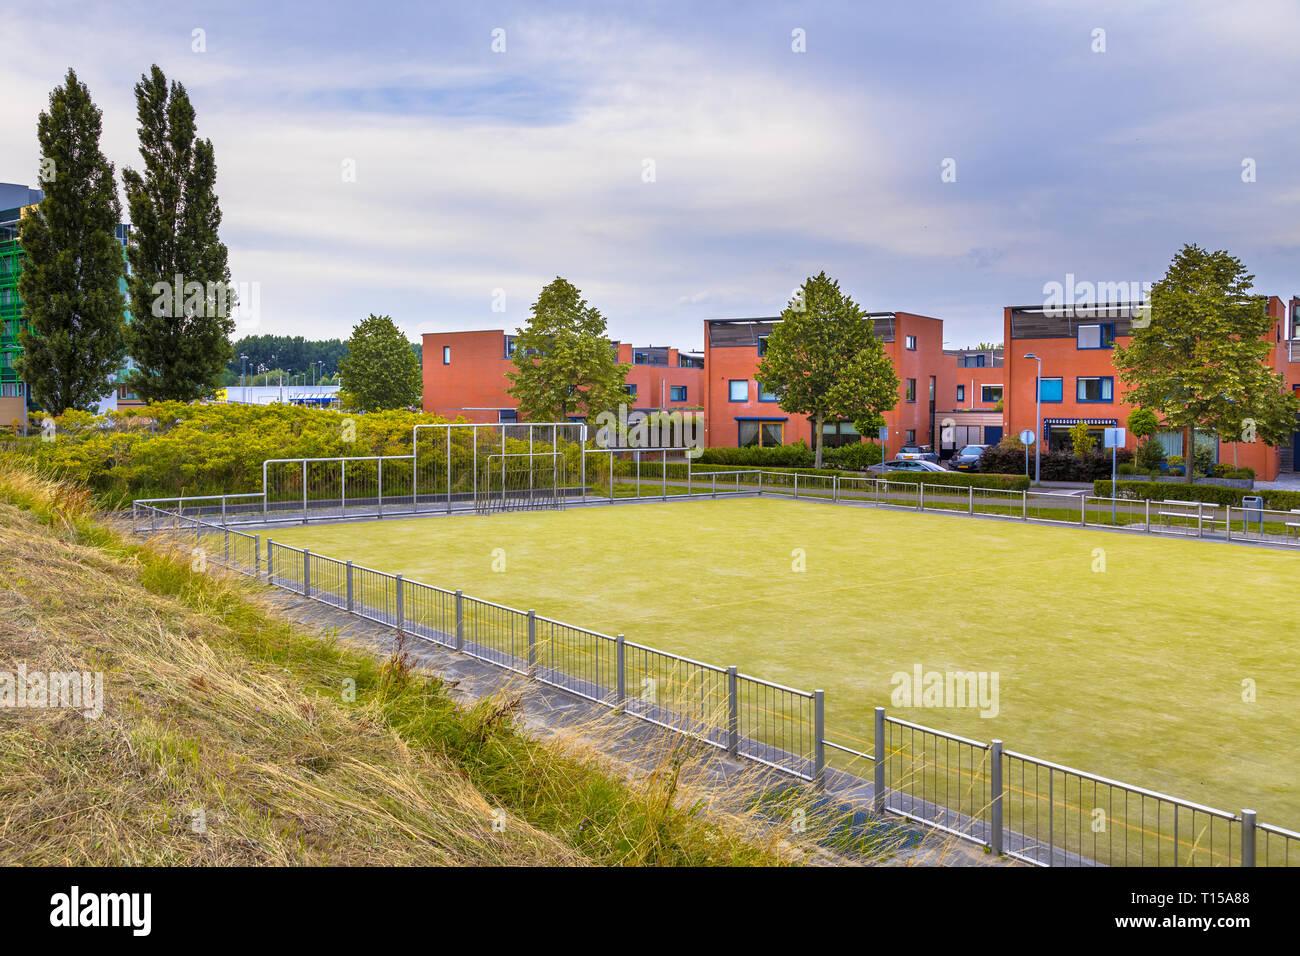 Soccer field in urban residential neighborhood Stock Photo